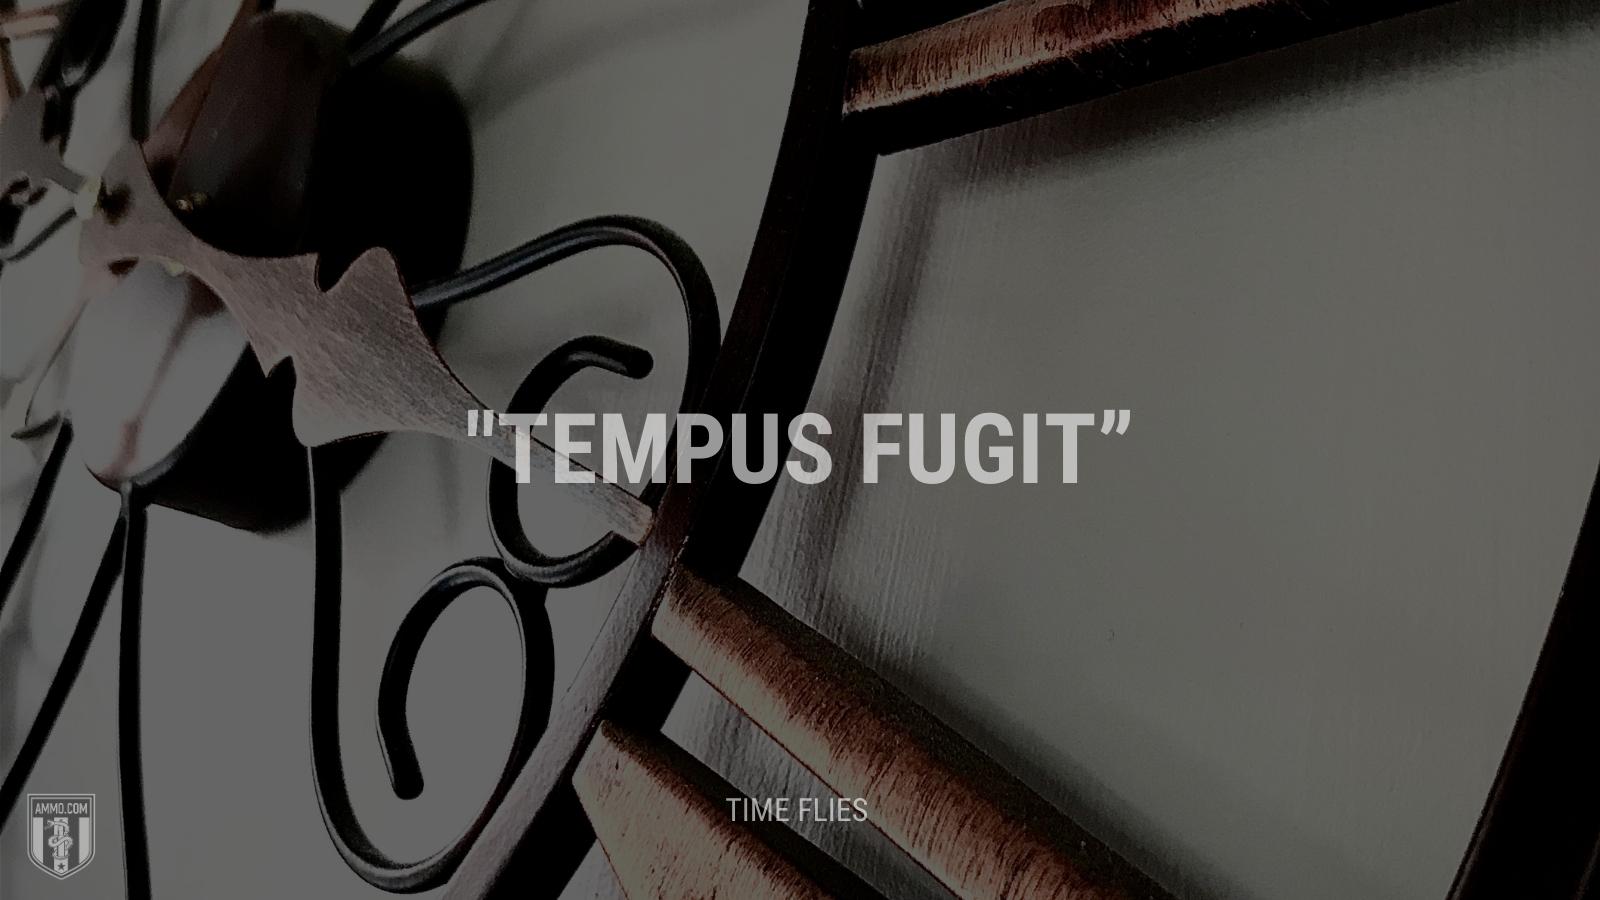 """Tempus fugit"" - Time flies"